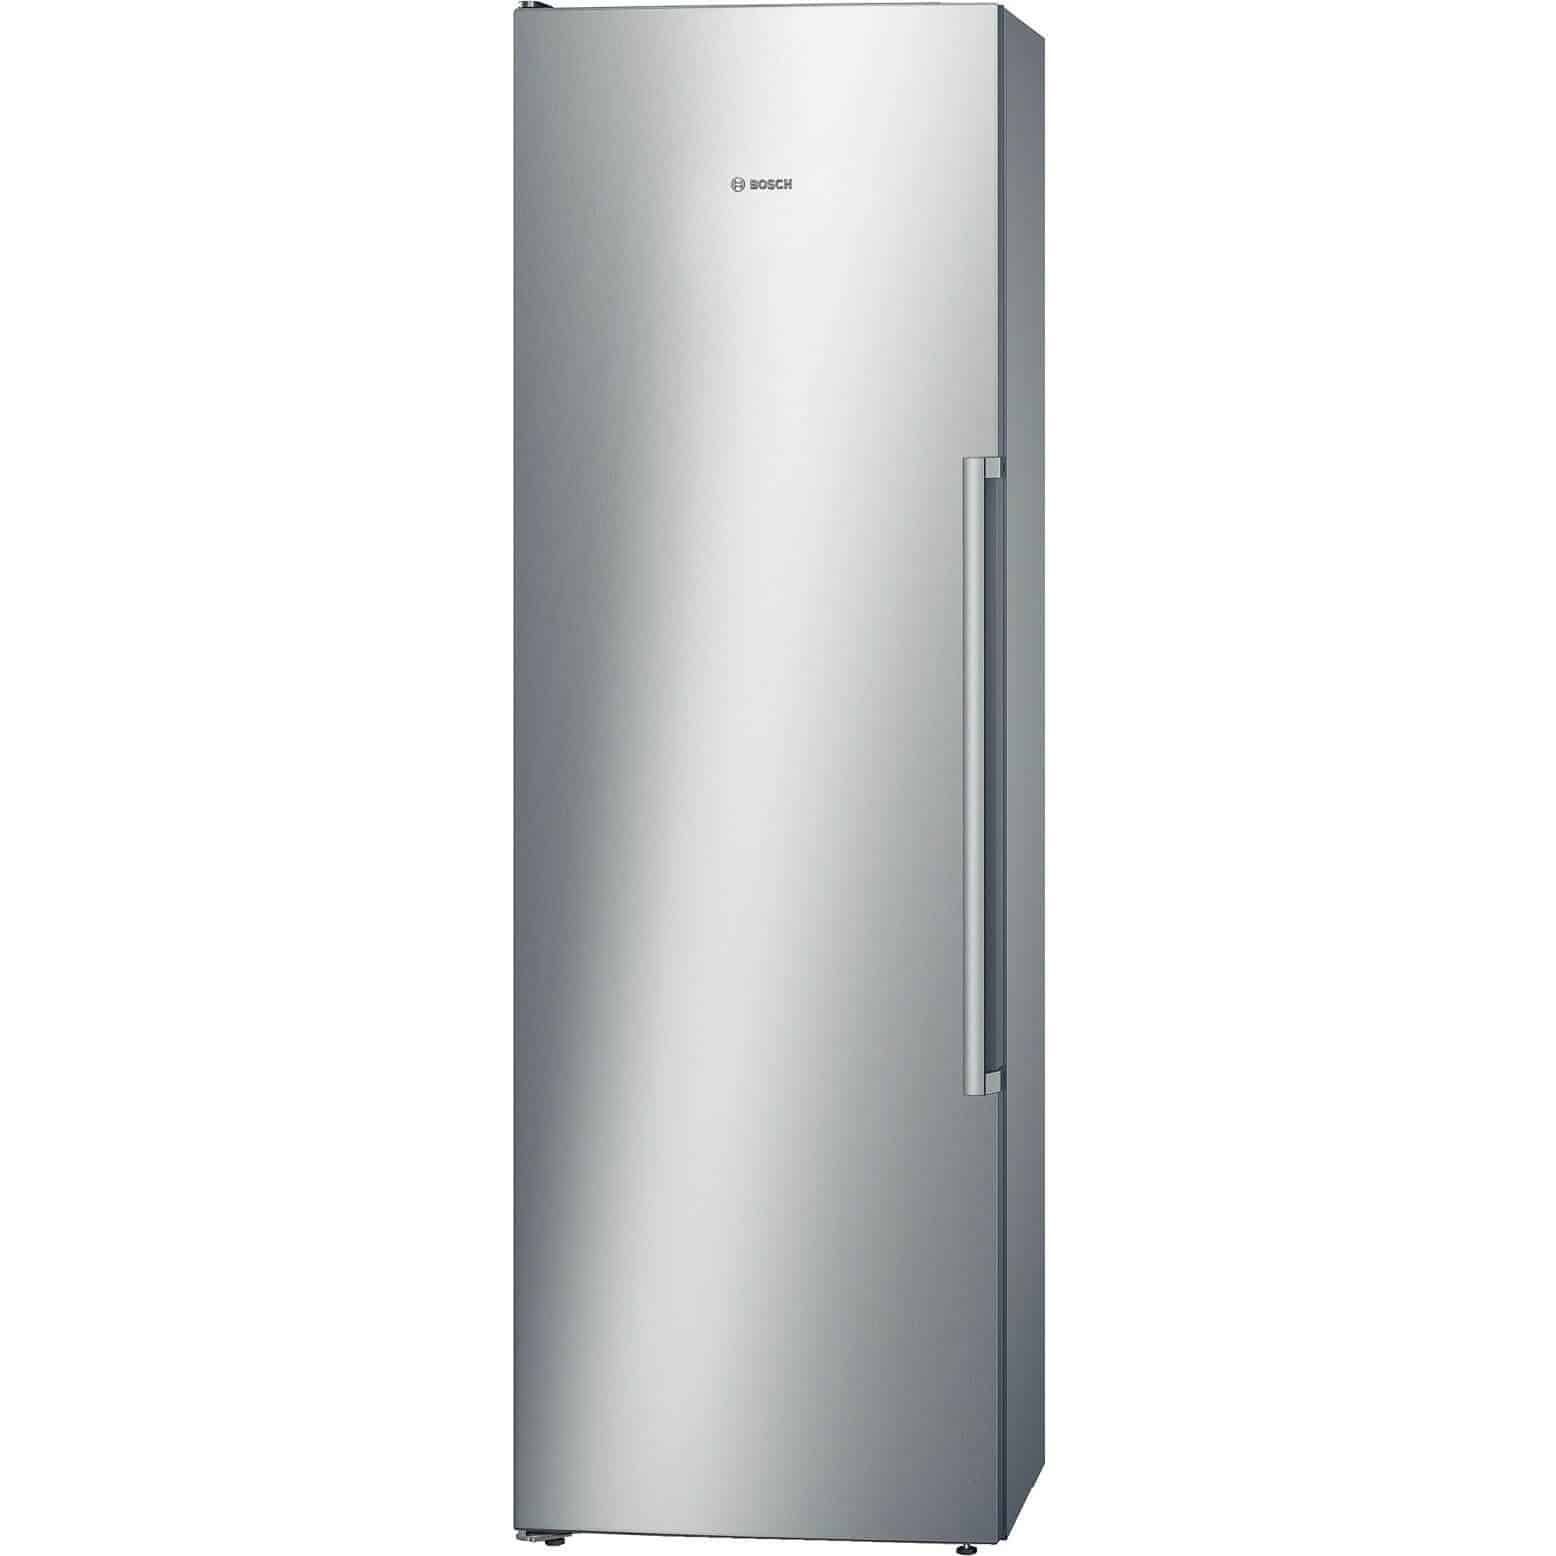 Frigider Bosch KSV36AI31, 346 l, Clasa A++, H 186 cm, Inox